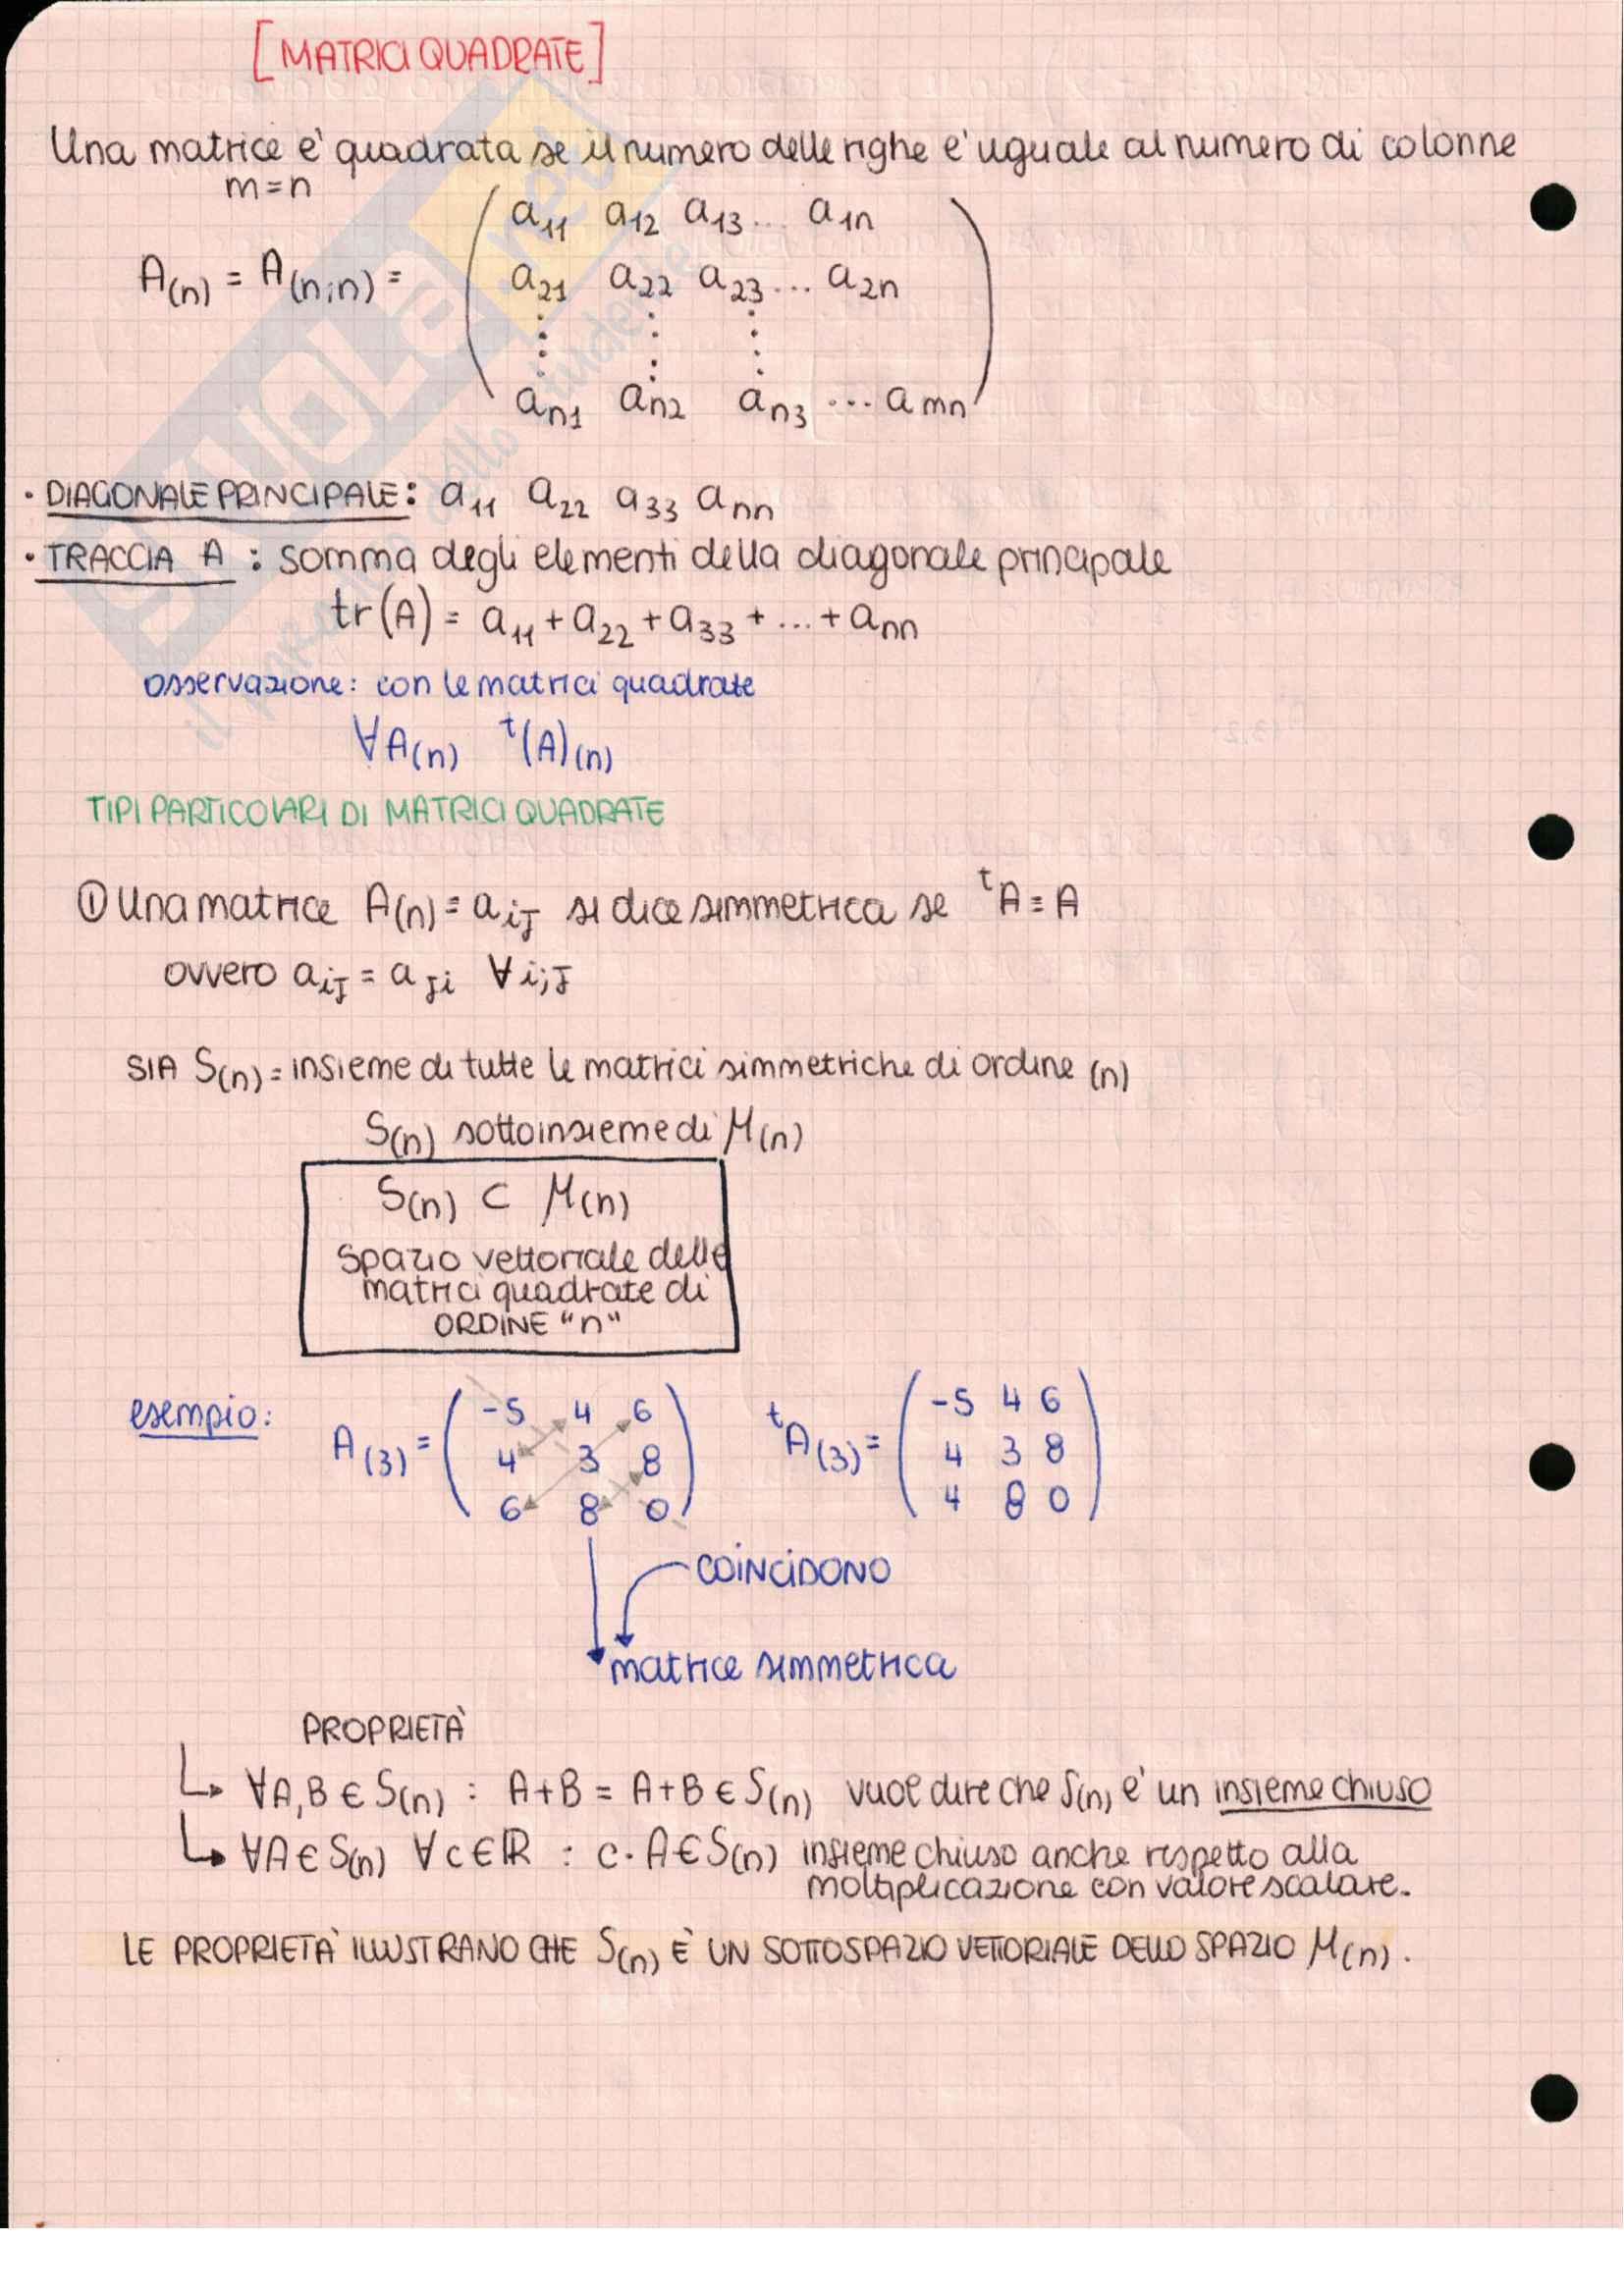 Geometria e algebra lineare, Matrici quadrate: tipi e proprietà